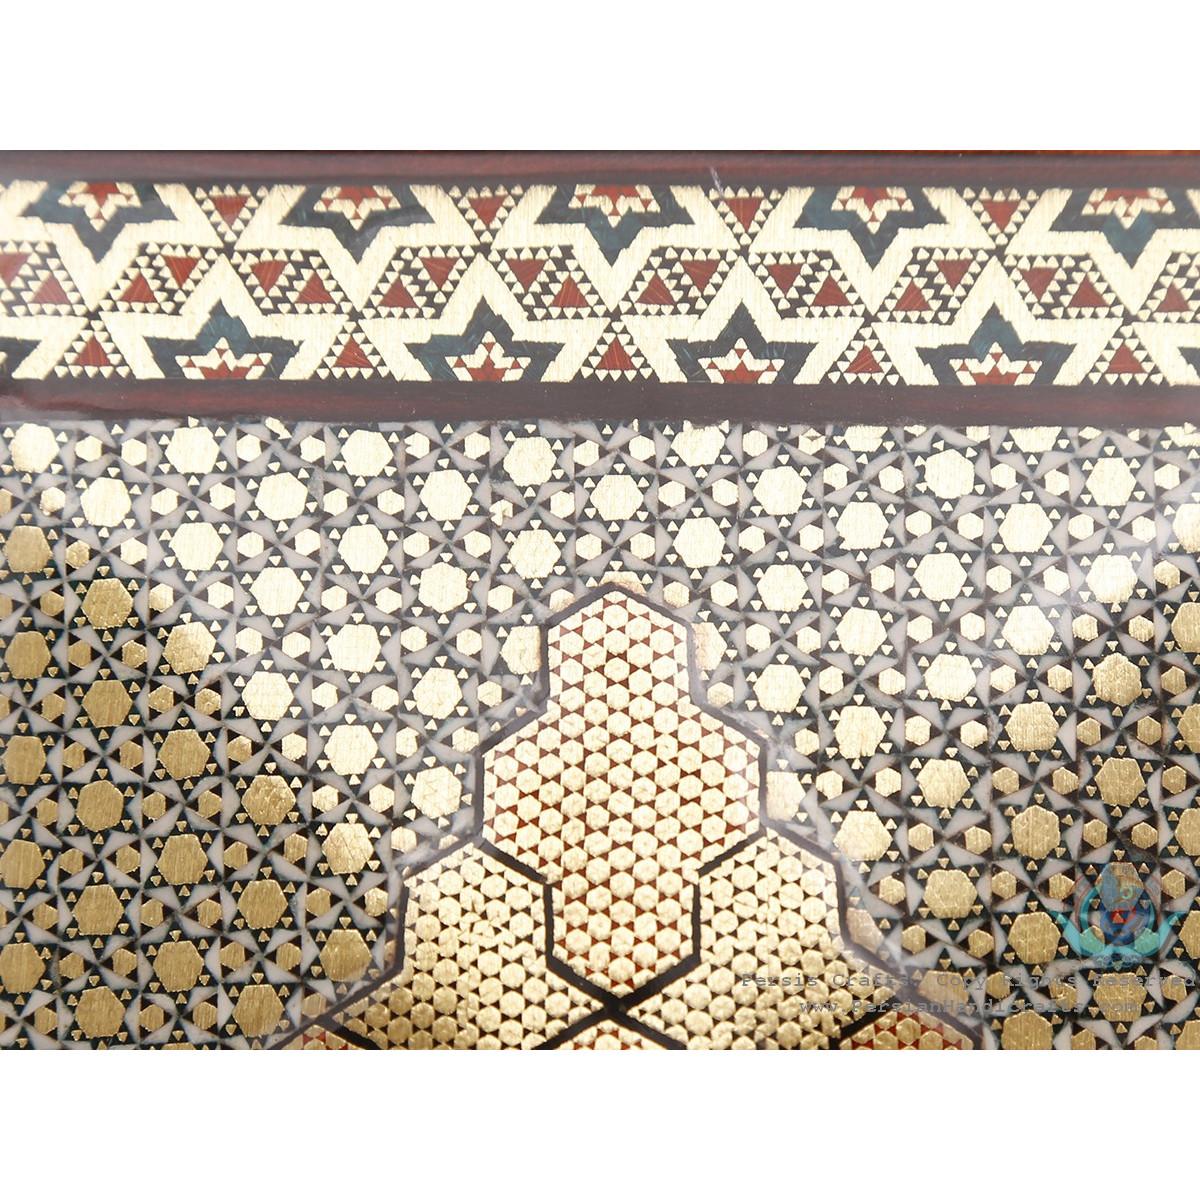 Privileged Design Khatam Marquetry on Hut Shape Decore Box - HKH3907-Persian Handicrafts